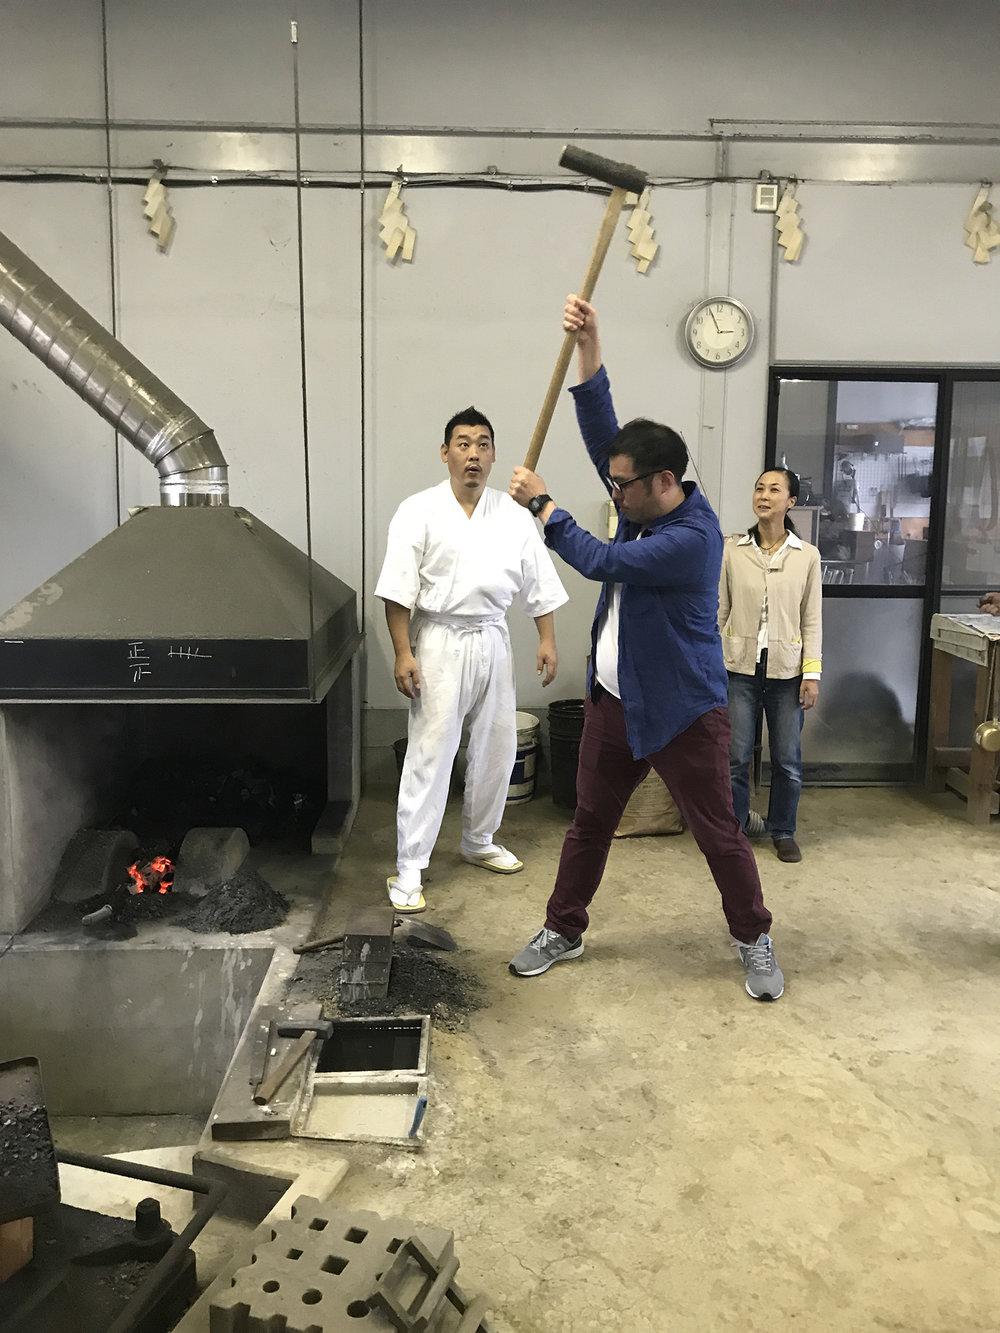 deeperjapan_tokyo_katana_shimojima_sword_customer_06.JPG